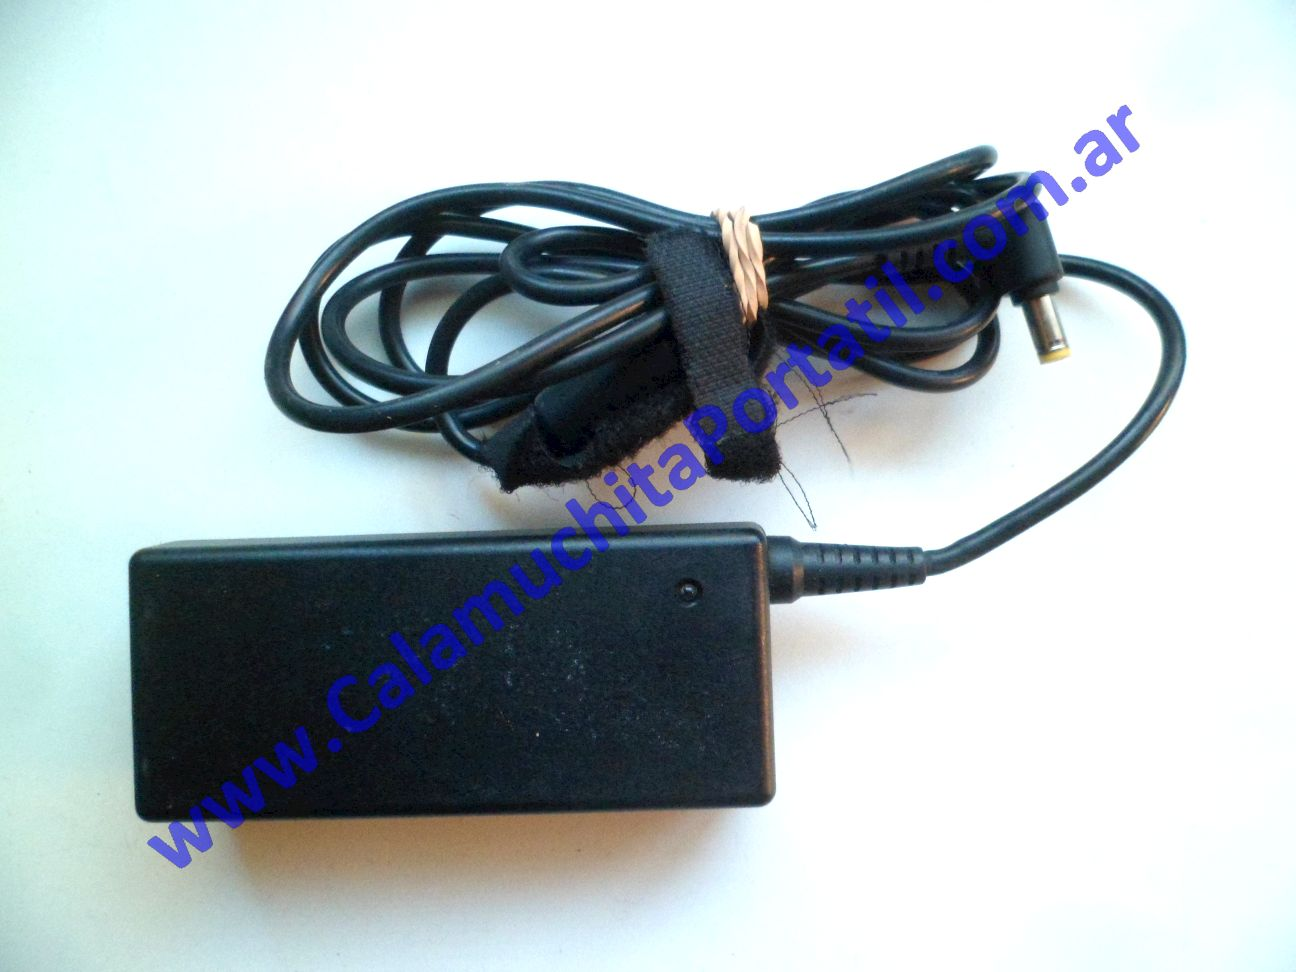 0588RCA Cargador Acer Aspire 4540-1844 / KBLG0